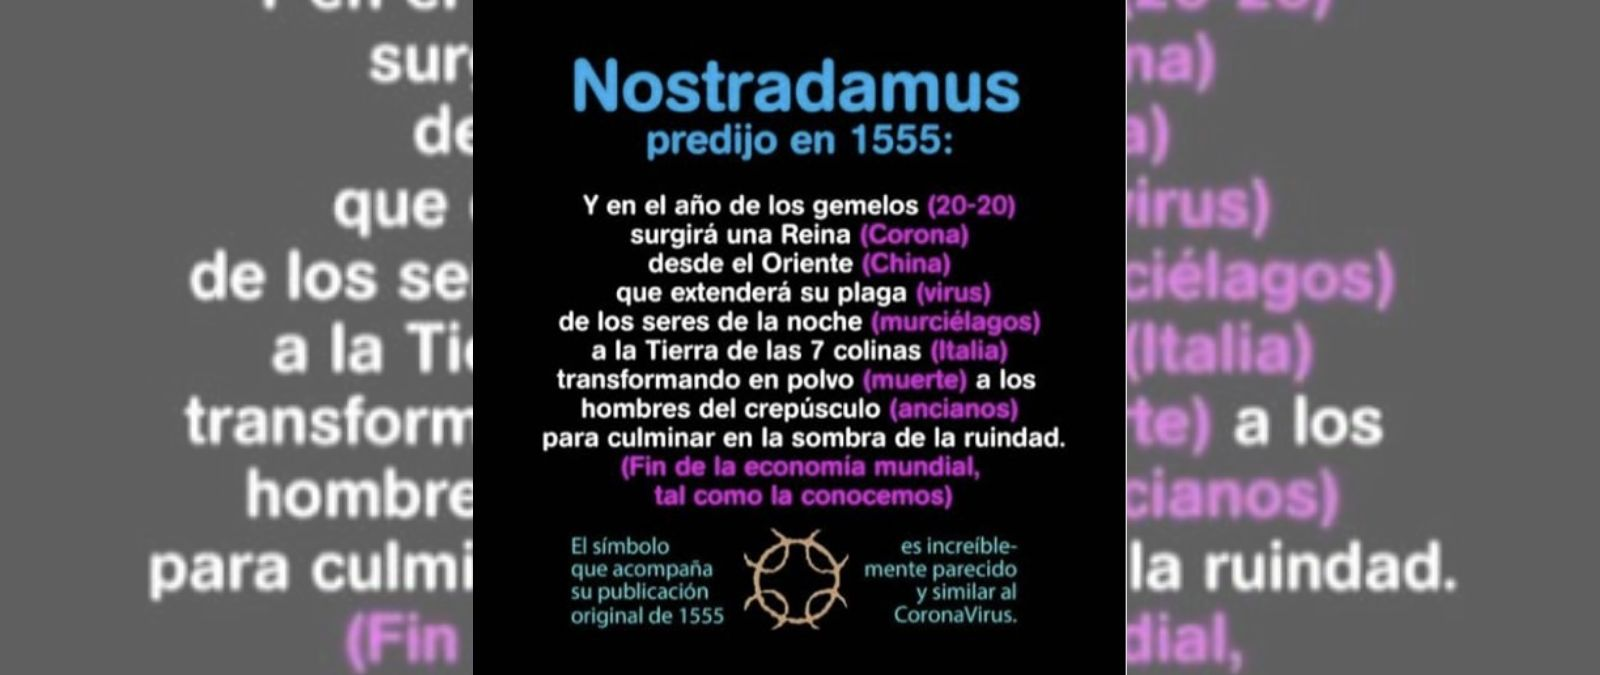 Coronavirus: Nostradamus l'a-t-il prédit?